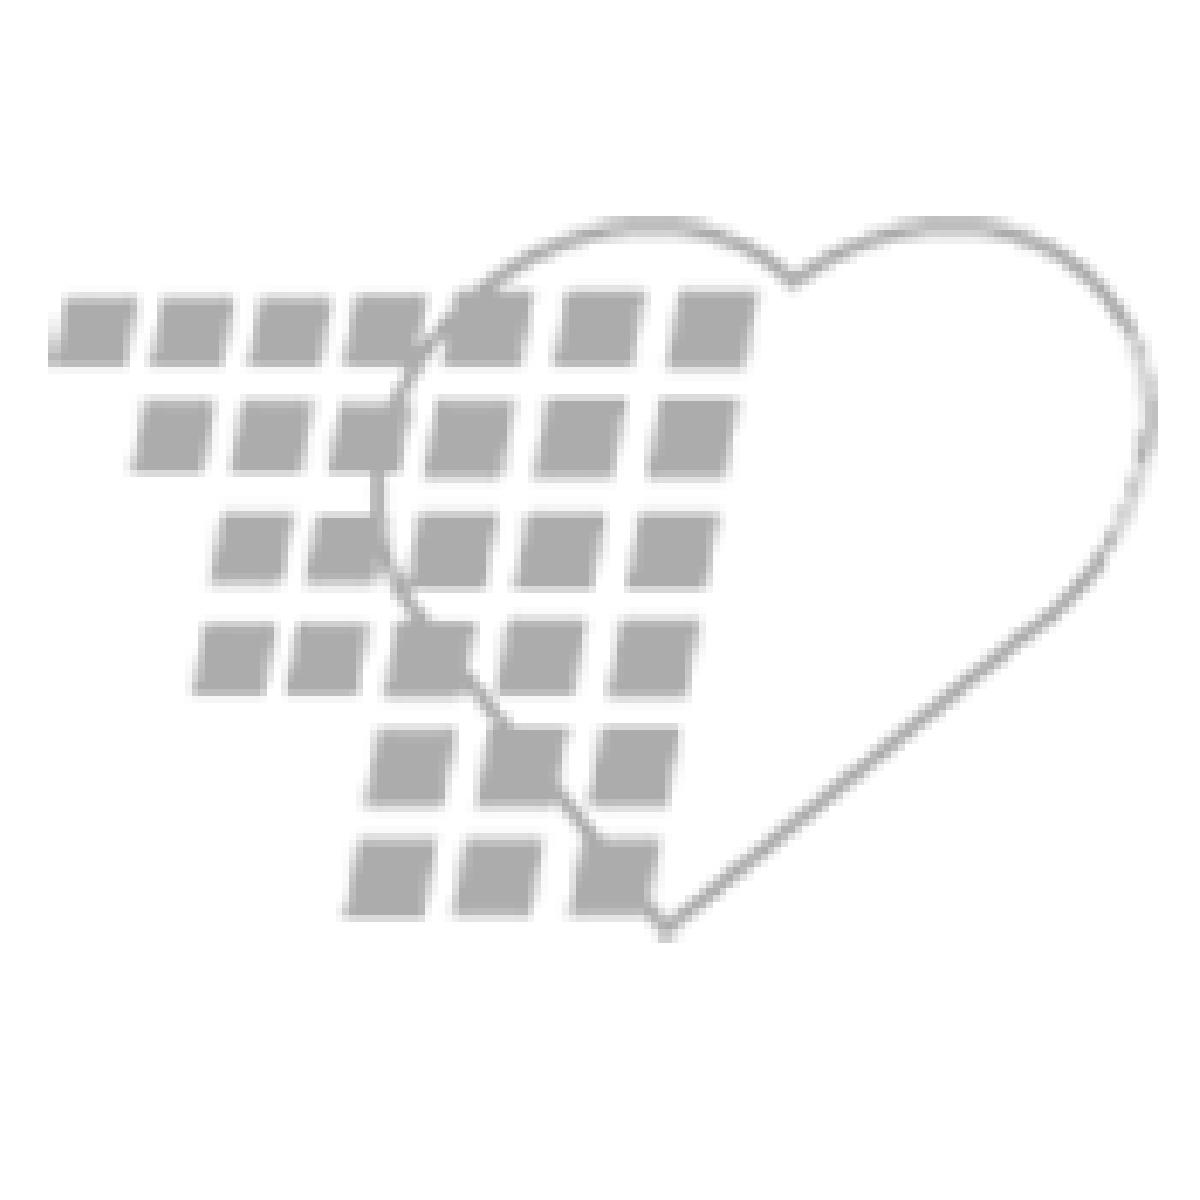 09-31-9982 - Pregnancy Wheel and Ovulation Calendar